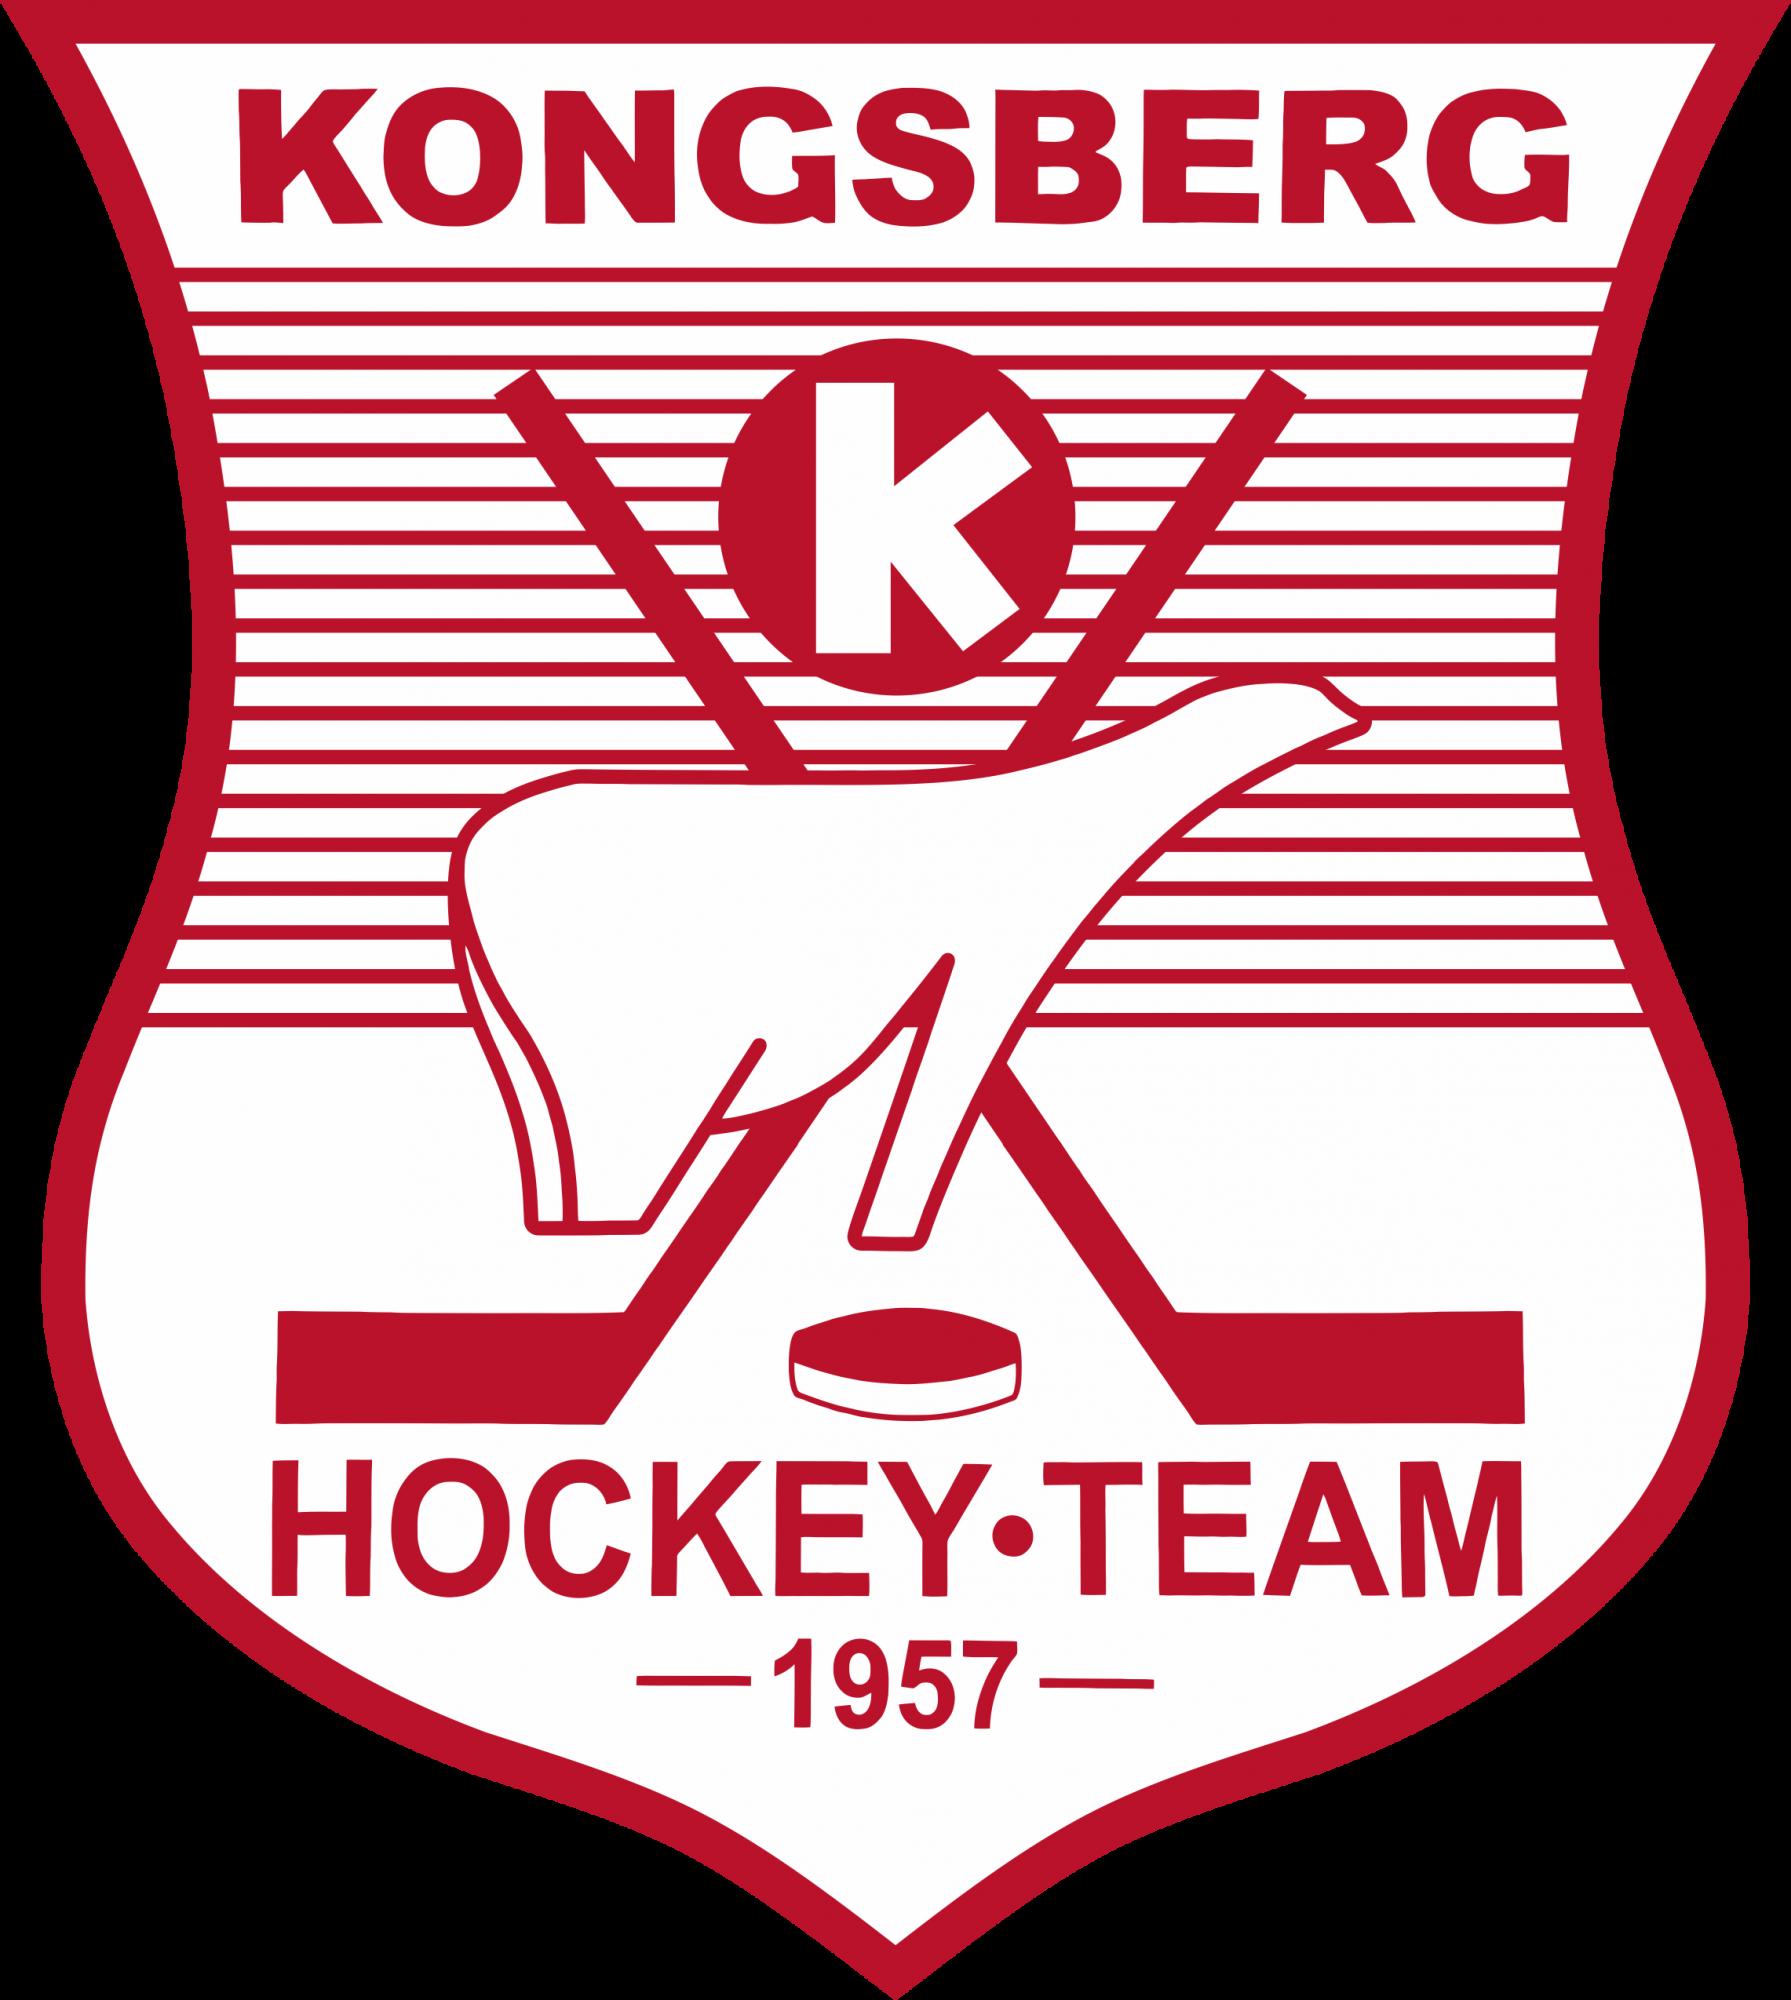 KONGSVINGER HOCKEY - iamhockey